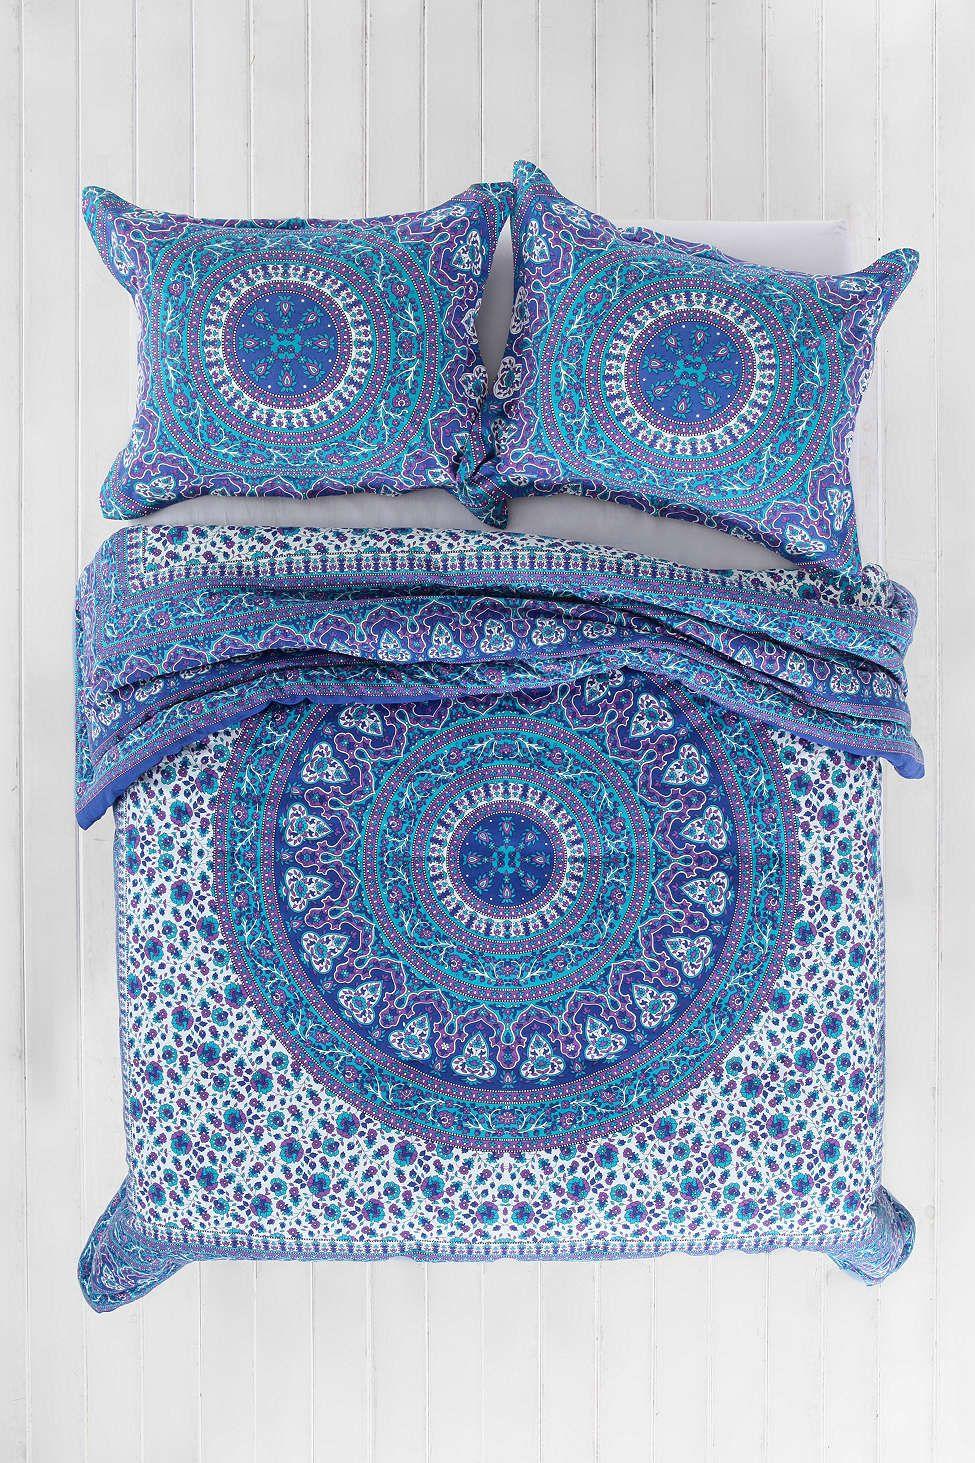 Magical Thinking Ophelia Medallion Comforter httpwwwurbanoutfitterscom urbancatalogproductdetailjspidu003d32159519u0026parentidu003dBRANDS